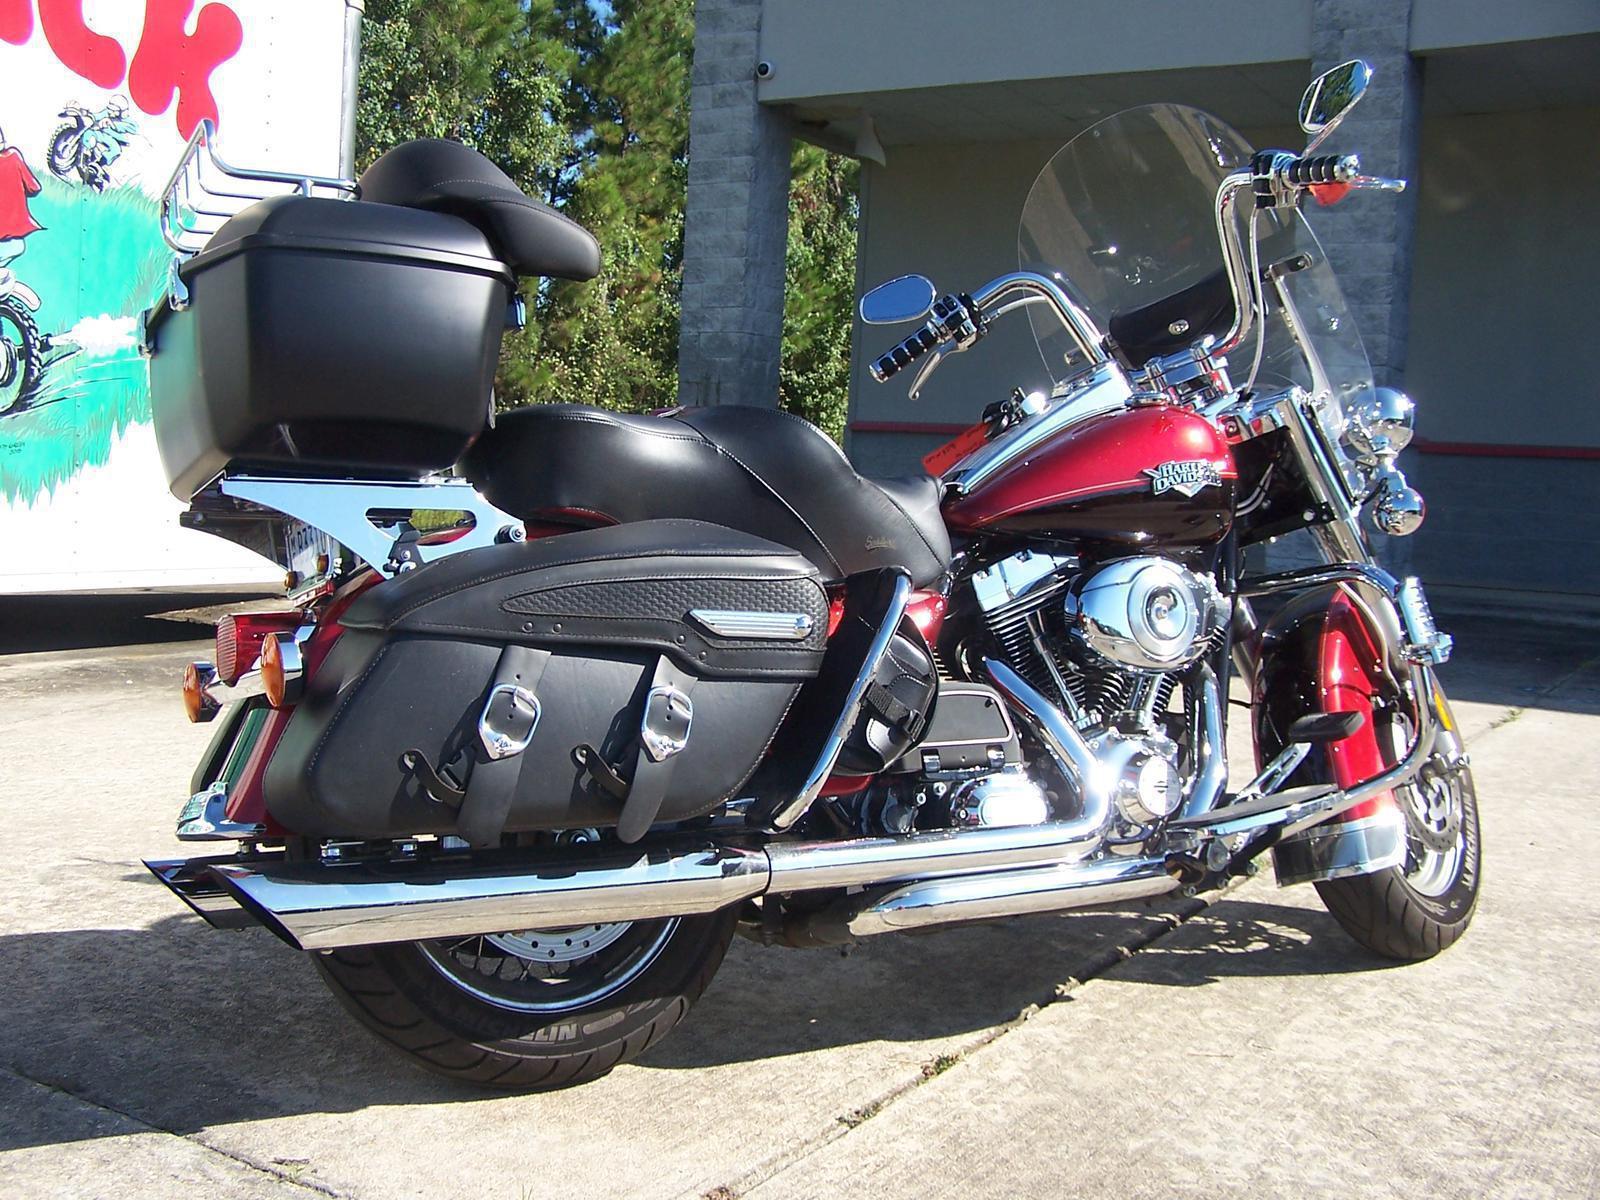 2013 Harley-Davidson® FLHRC Road King Classic